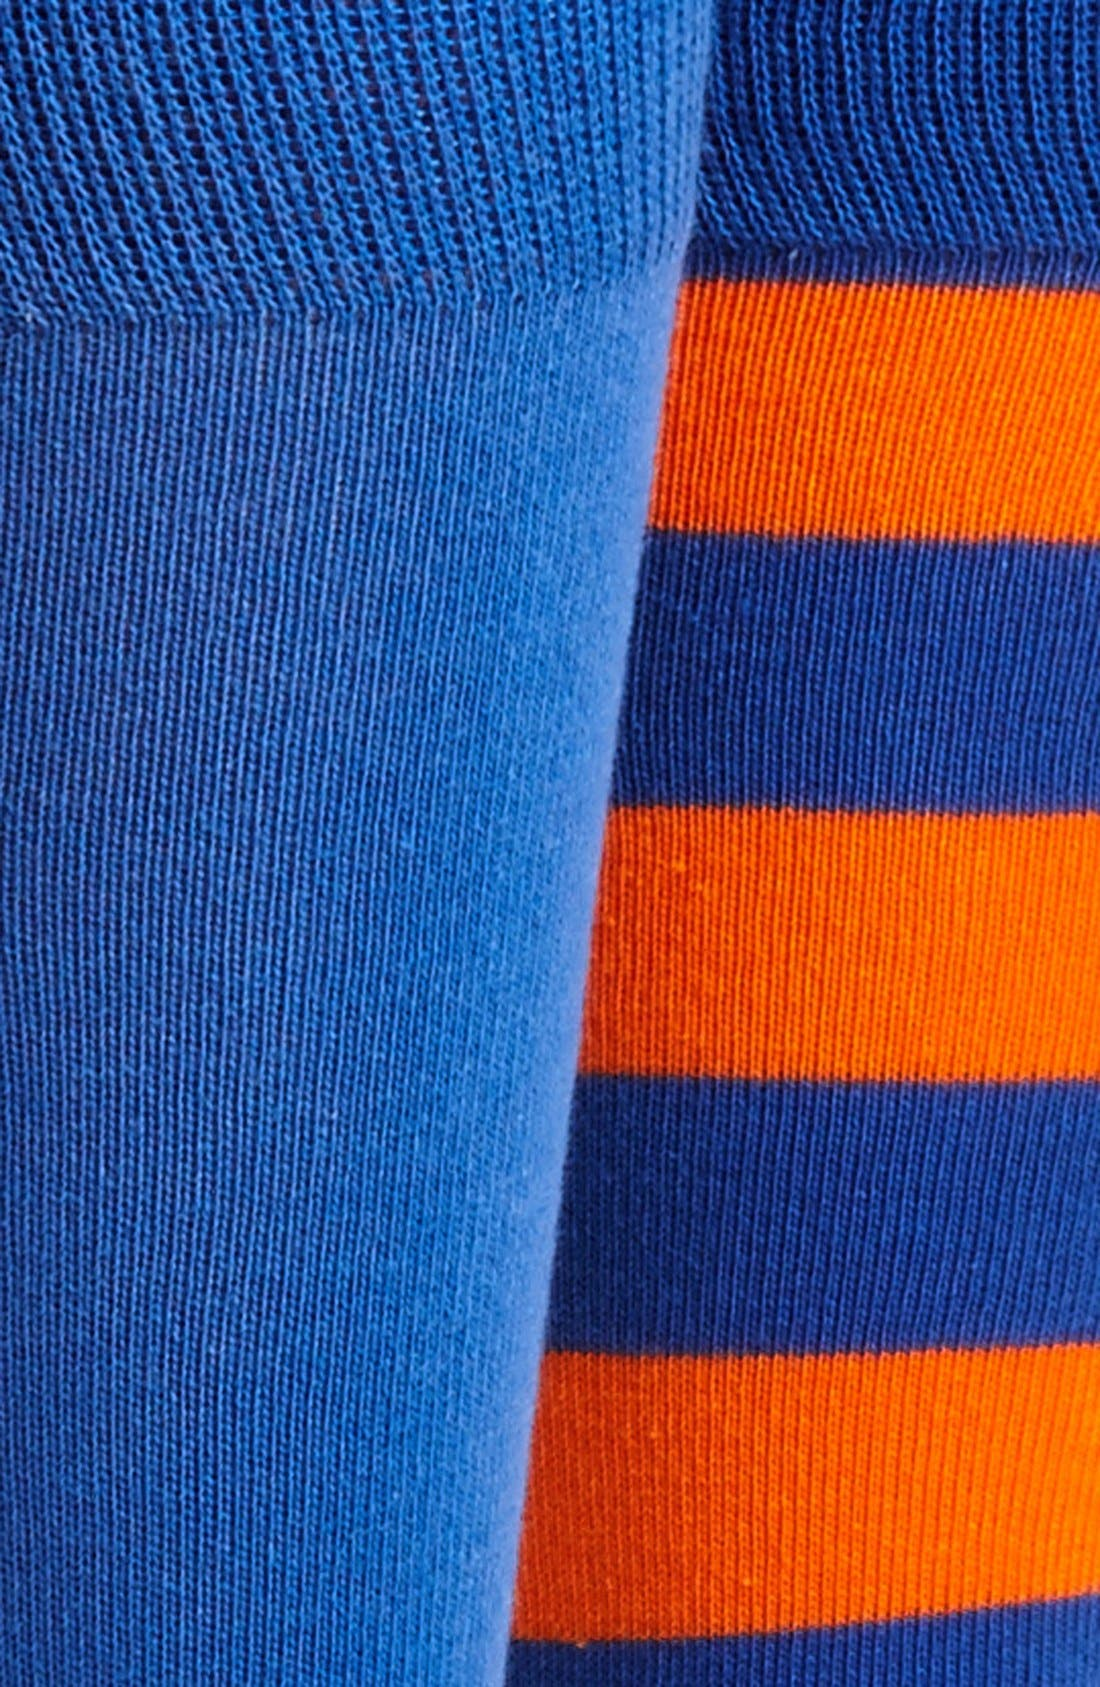 Cotton Blend Socks,                             Alternate thumbnail 30, color,